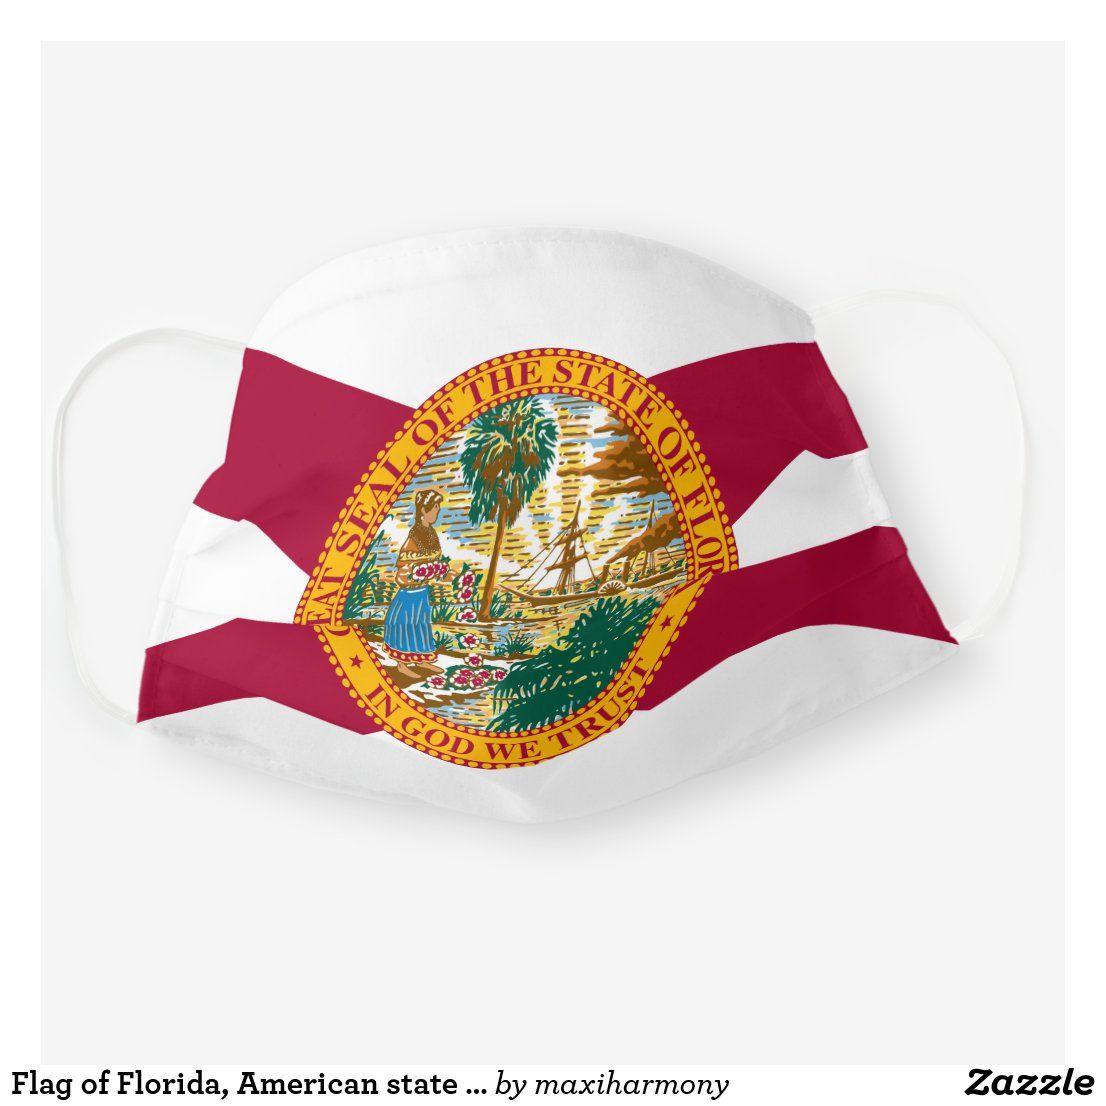 Flag Of Florida American State Flag Cloth Face Mask Zazzle Com In 2020 American State Flags Face Mask Florida Flag